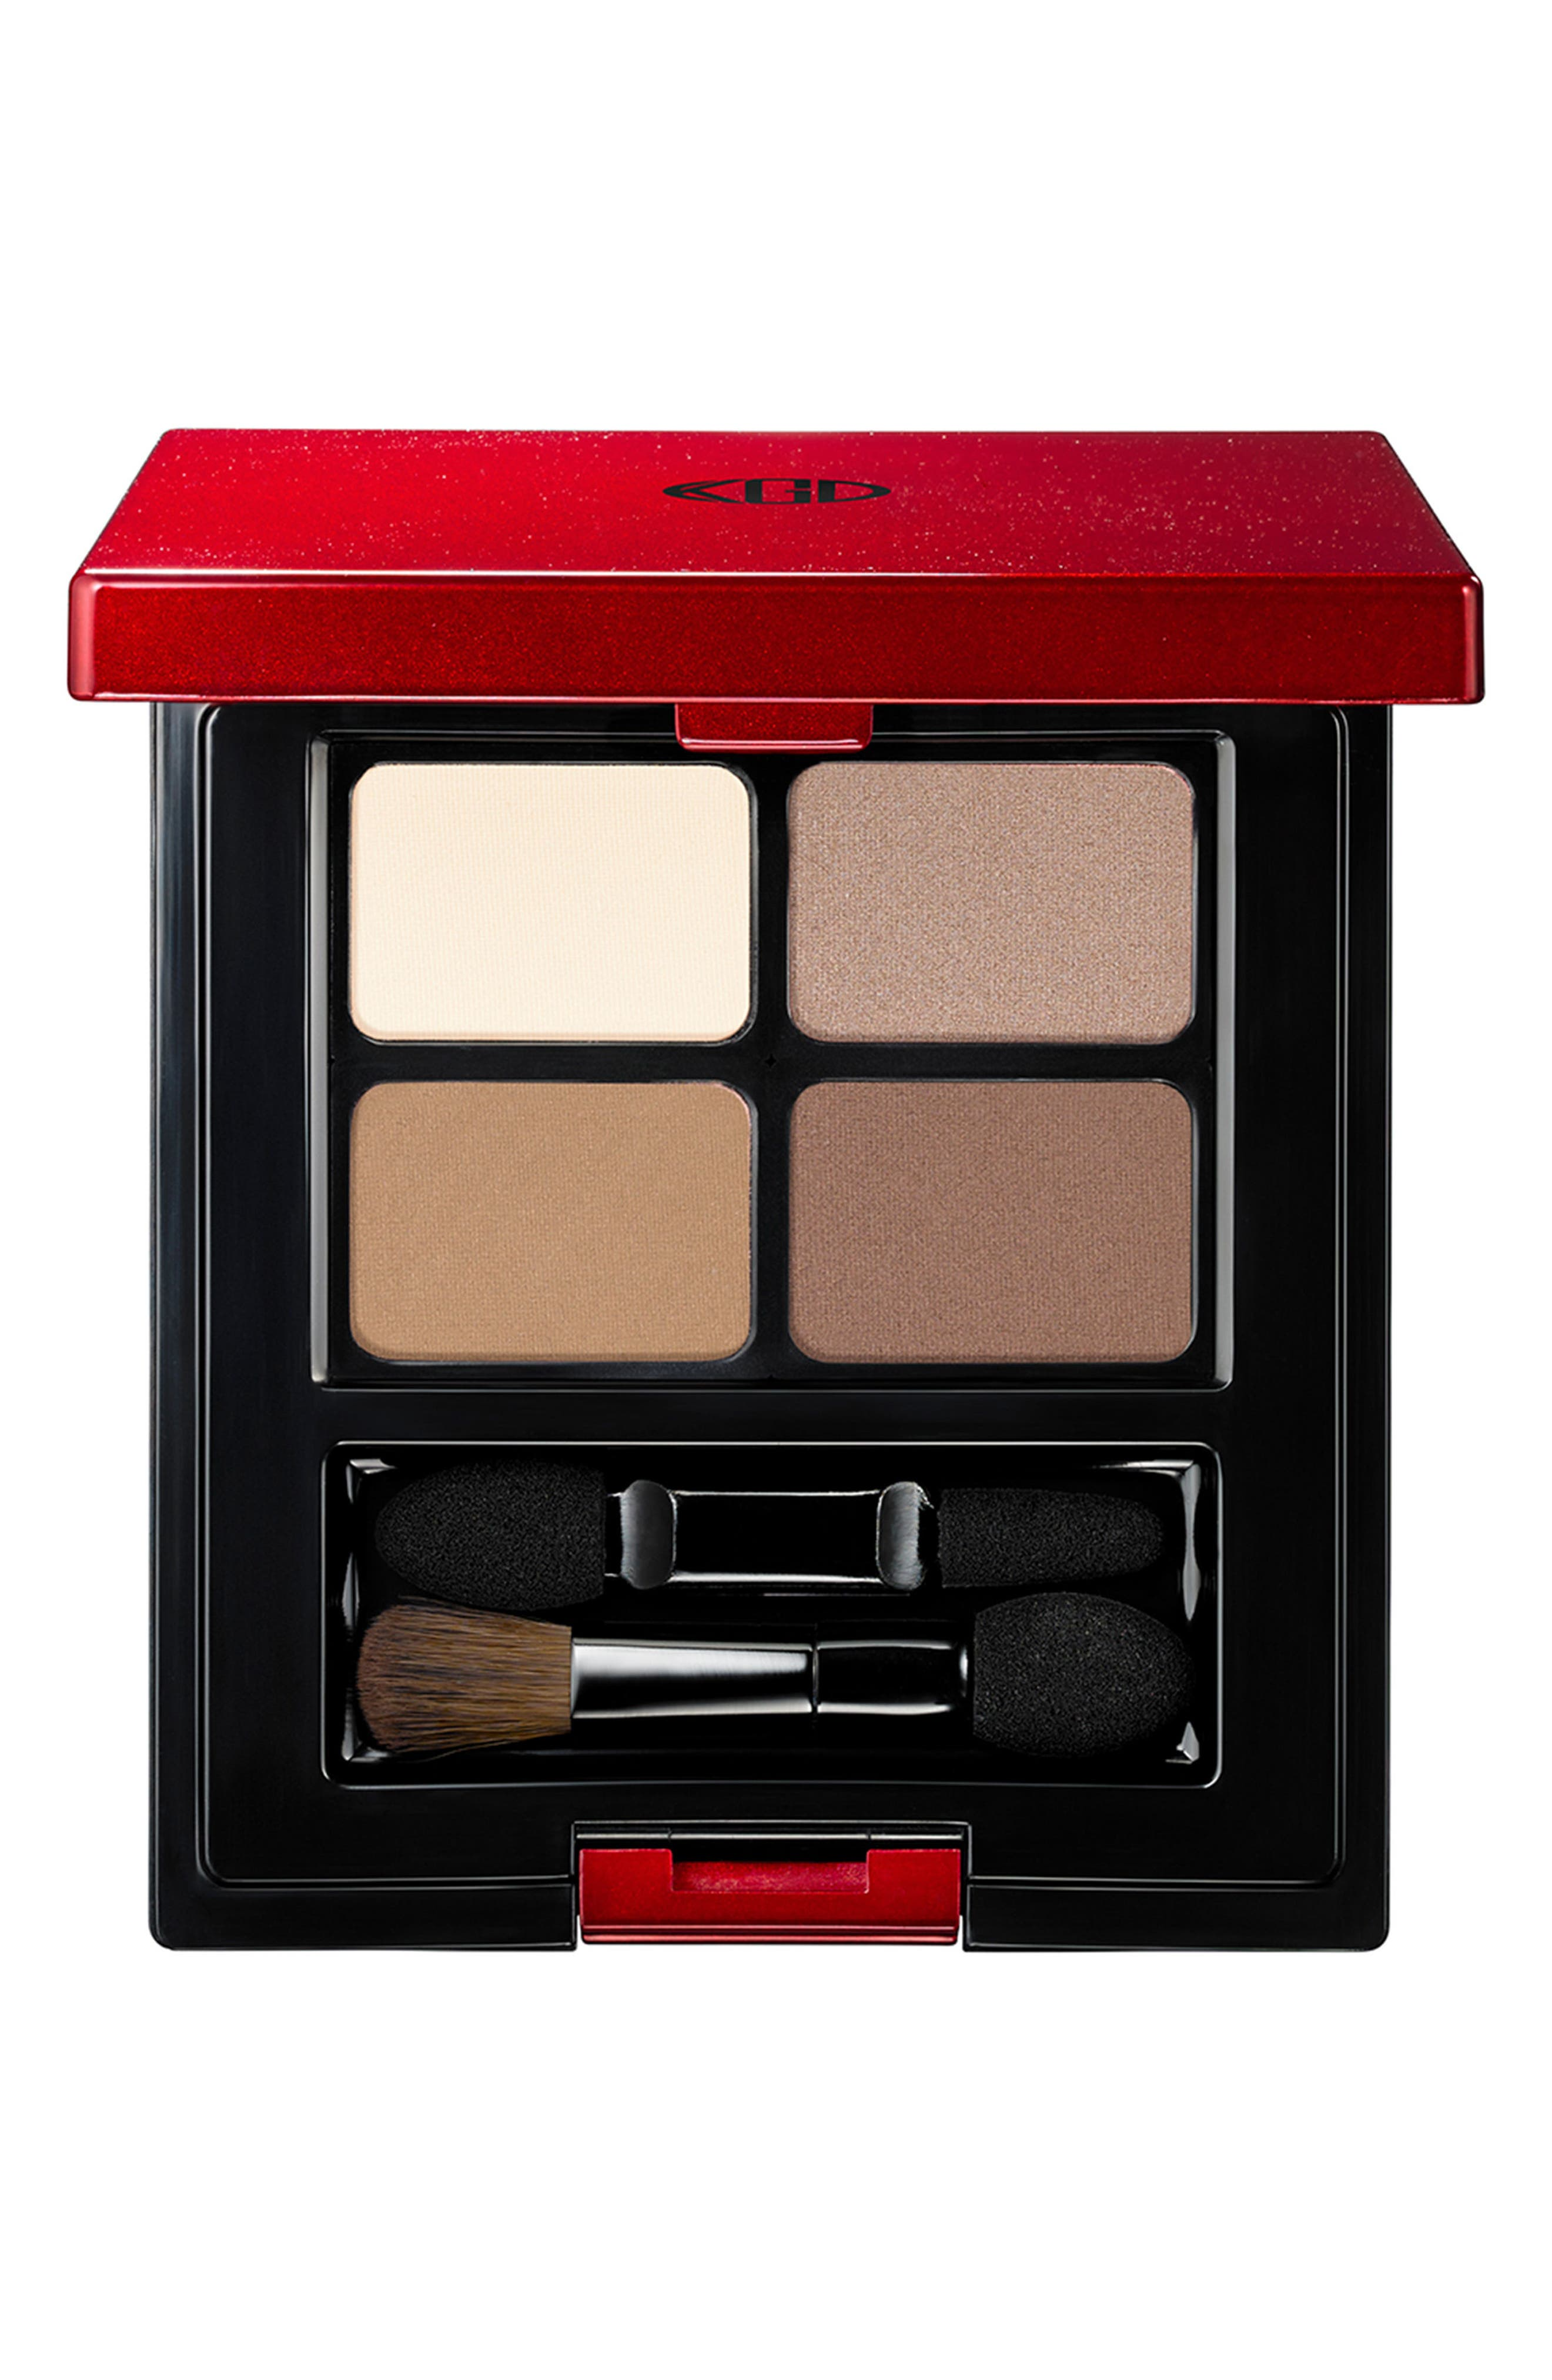 Maifanshi Mineral Eyeshadow Palette,                         Main,                         color, 01 WARM/BROWN